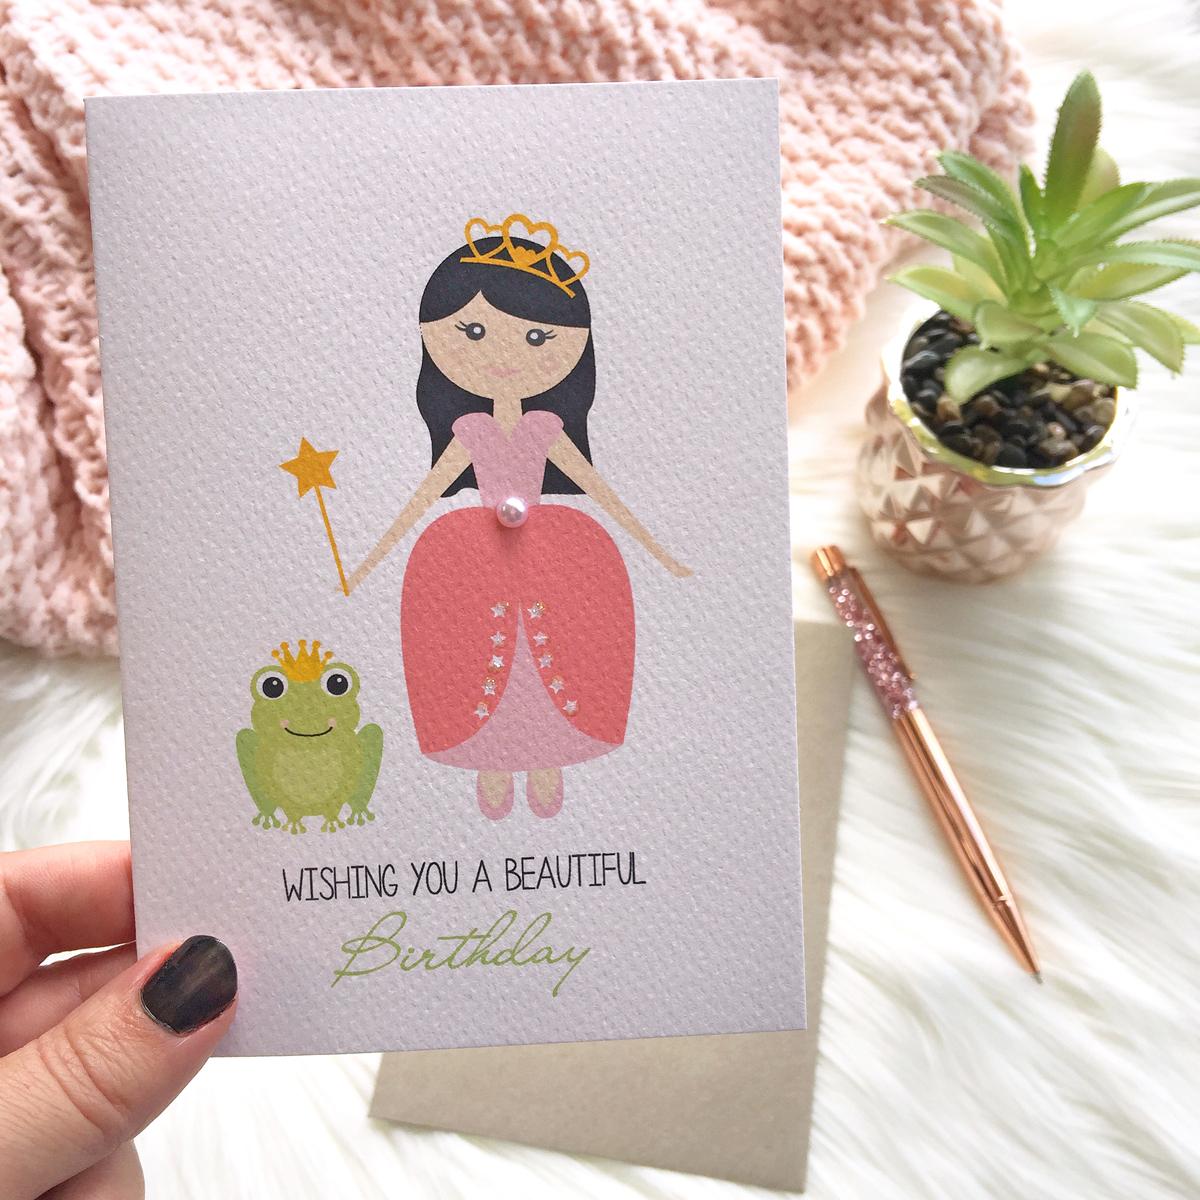 Handmade birthday card design with a princess theme